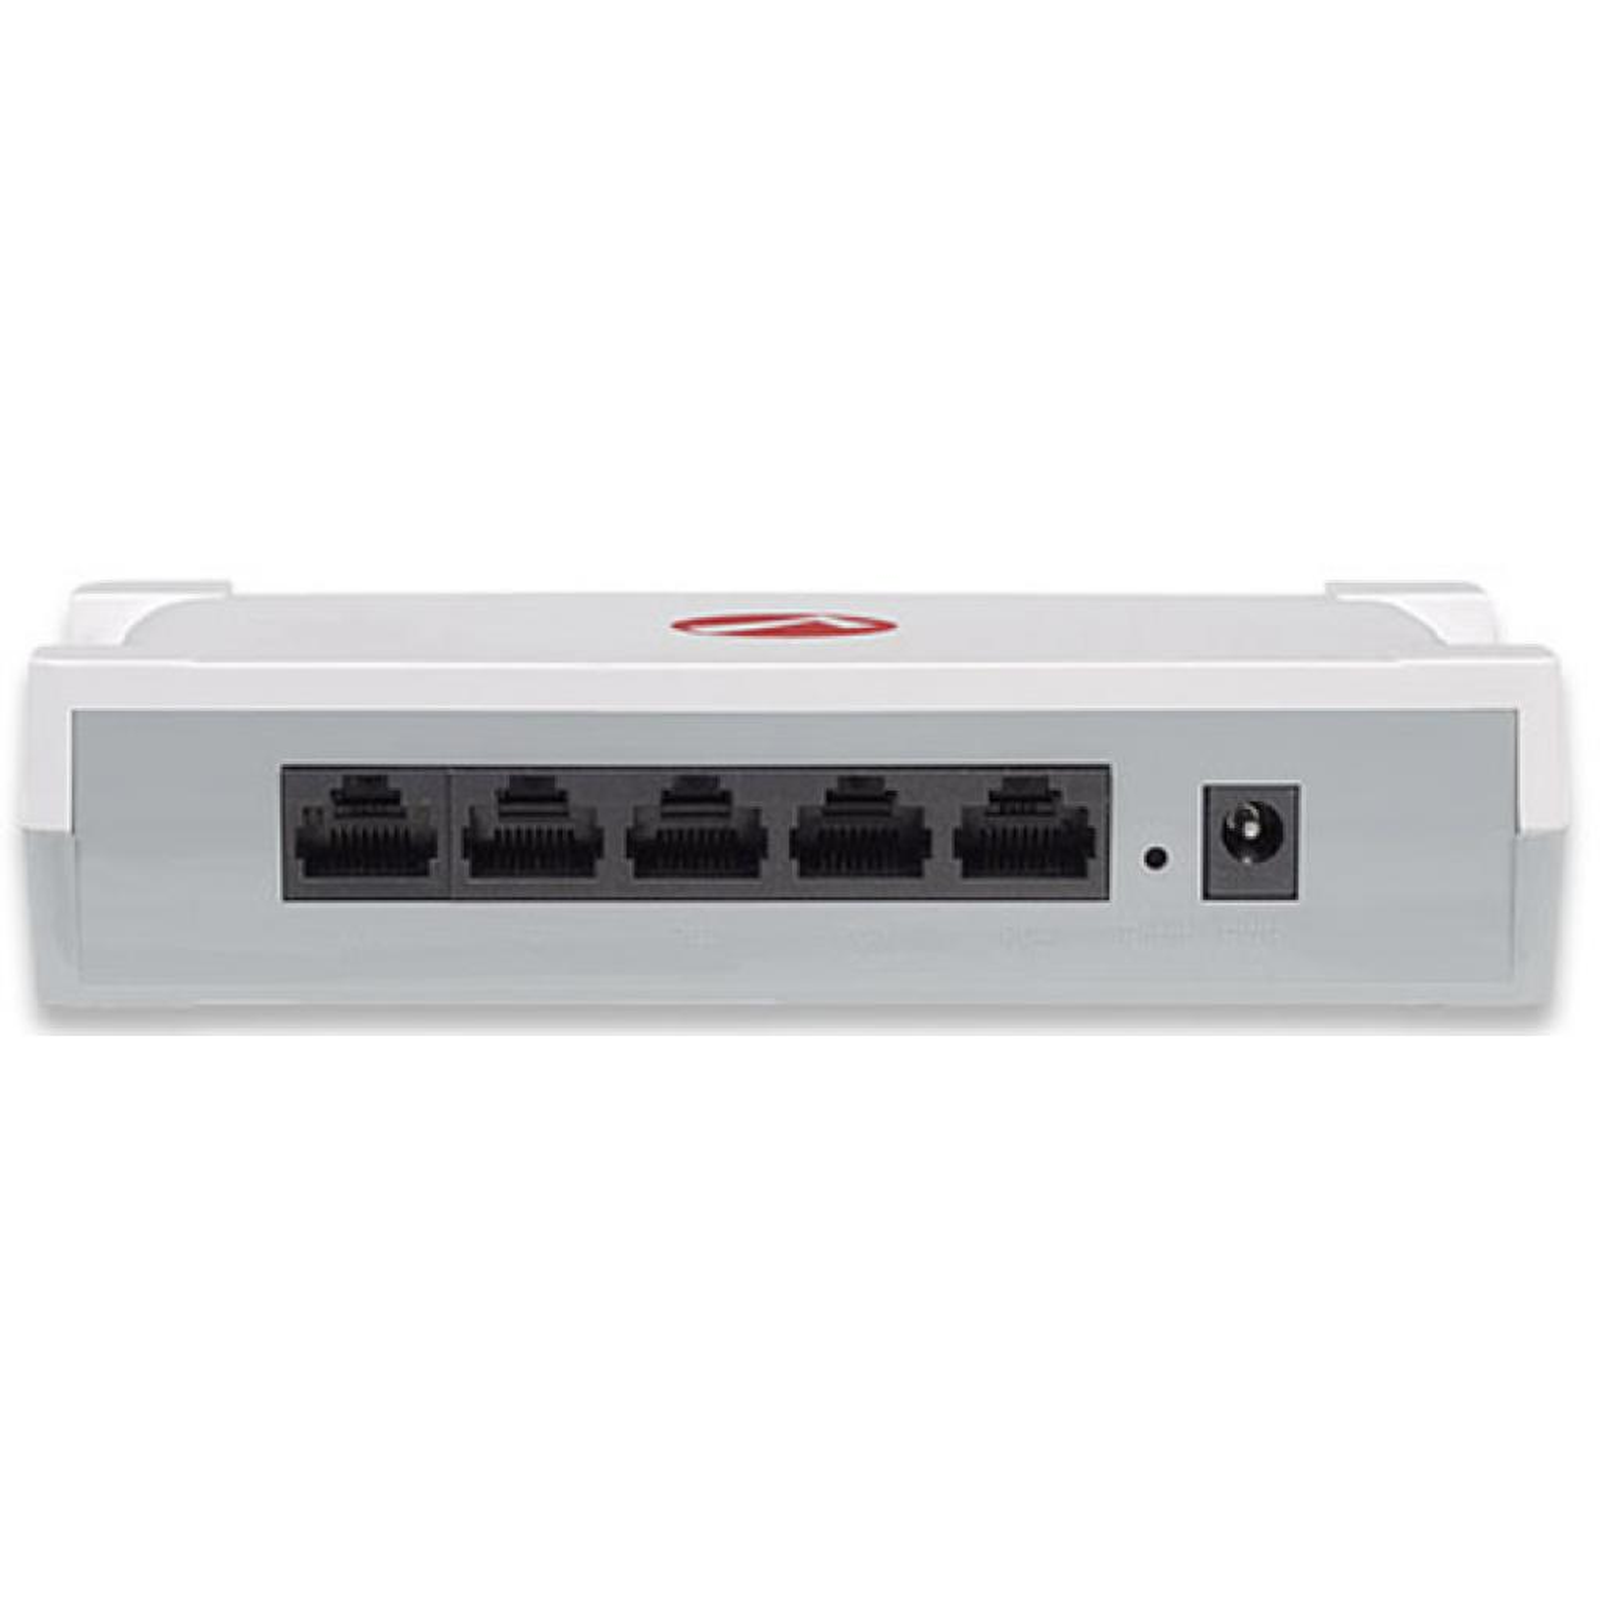 Маршрутизатор Intellinet 4-Port Broadband Router изображение 3